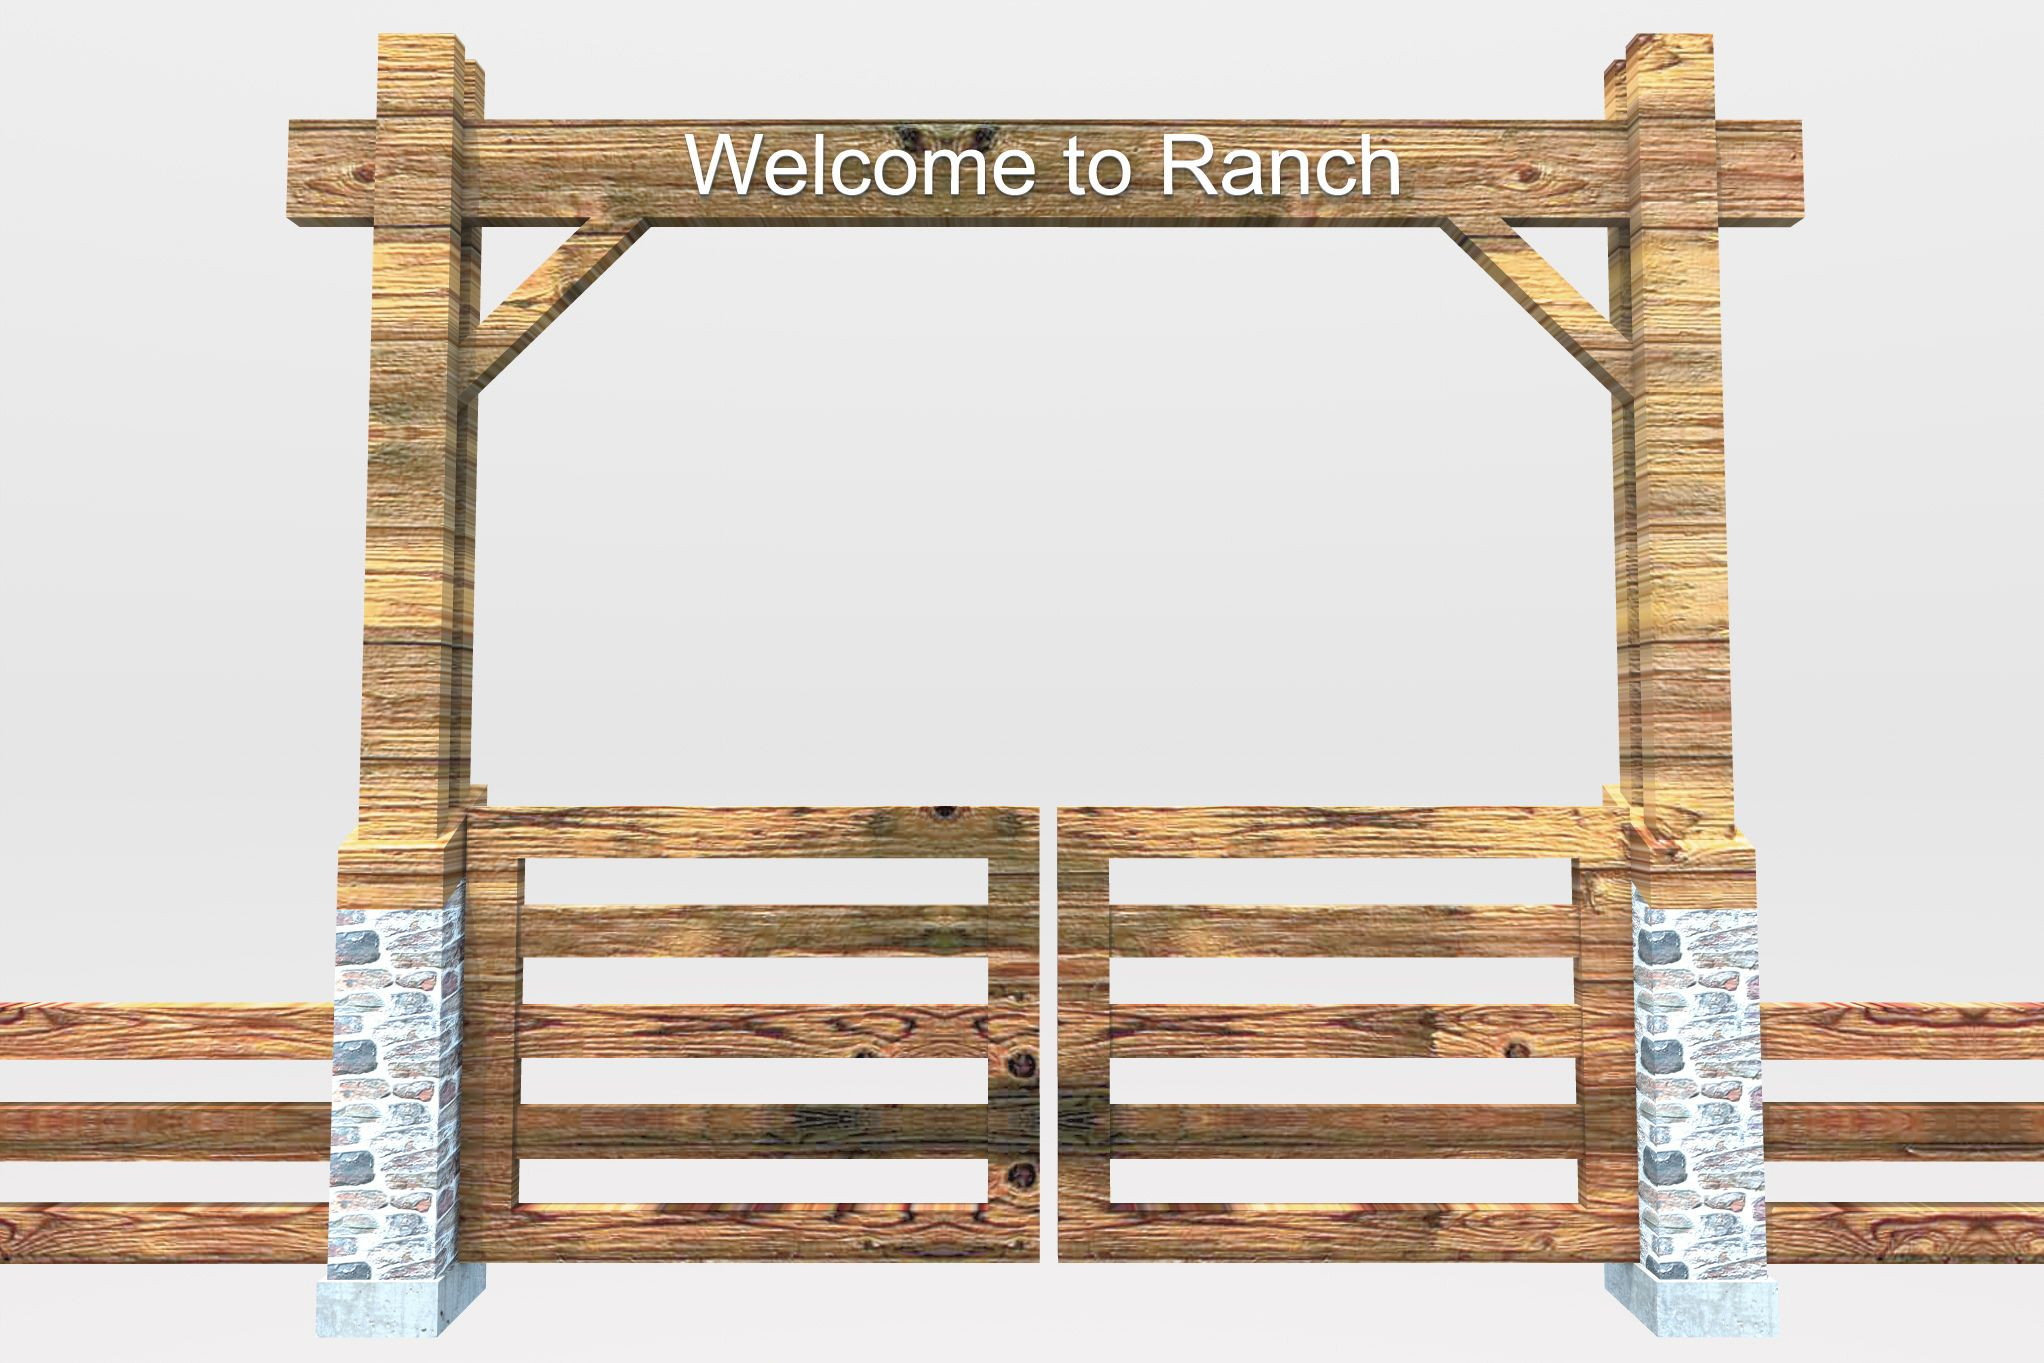 Barn clipart gate. Pix for ranch ideas